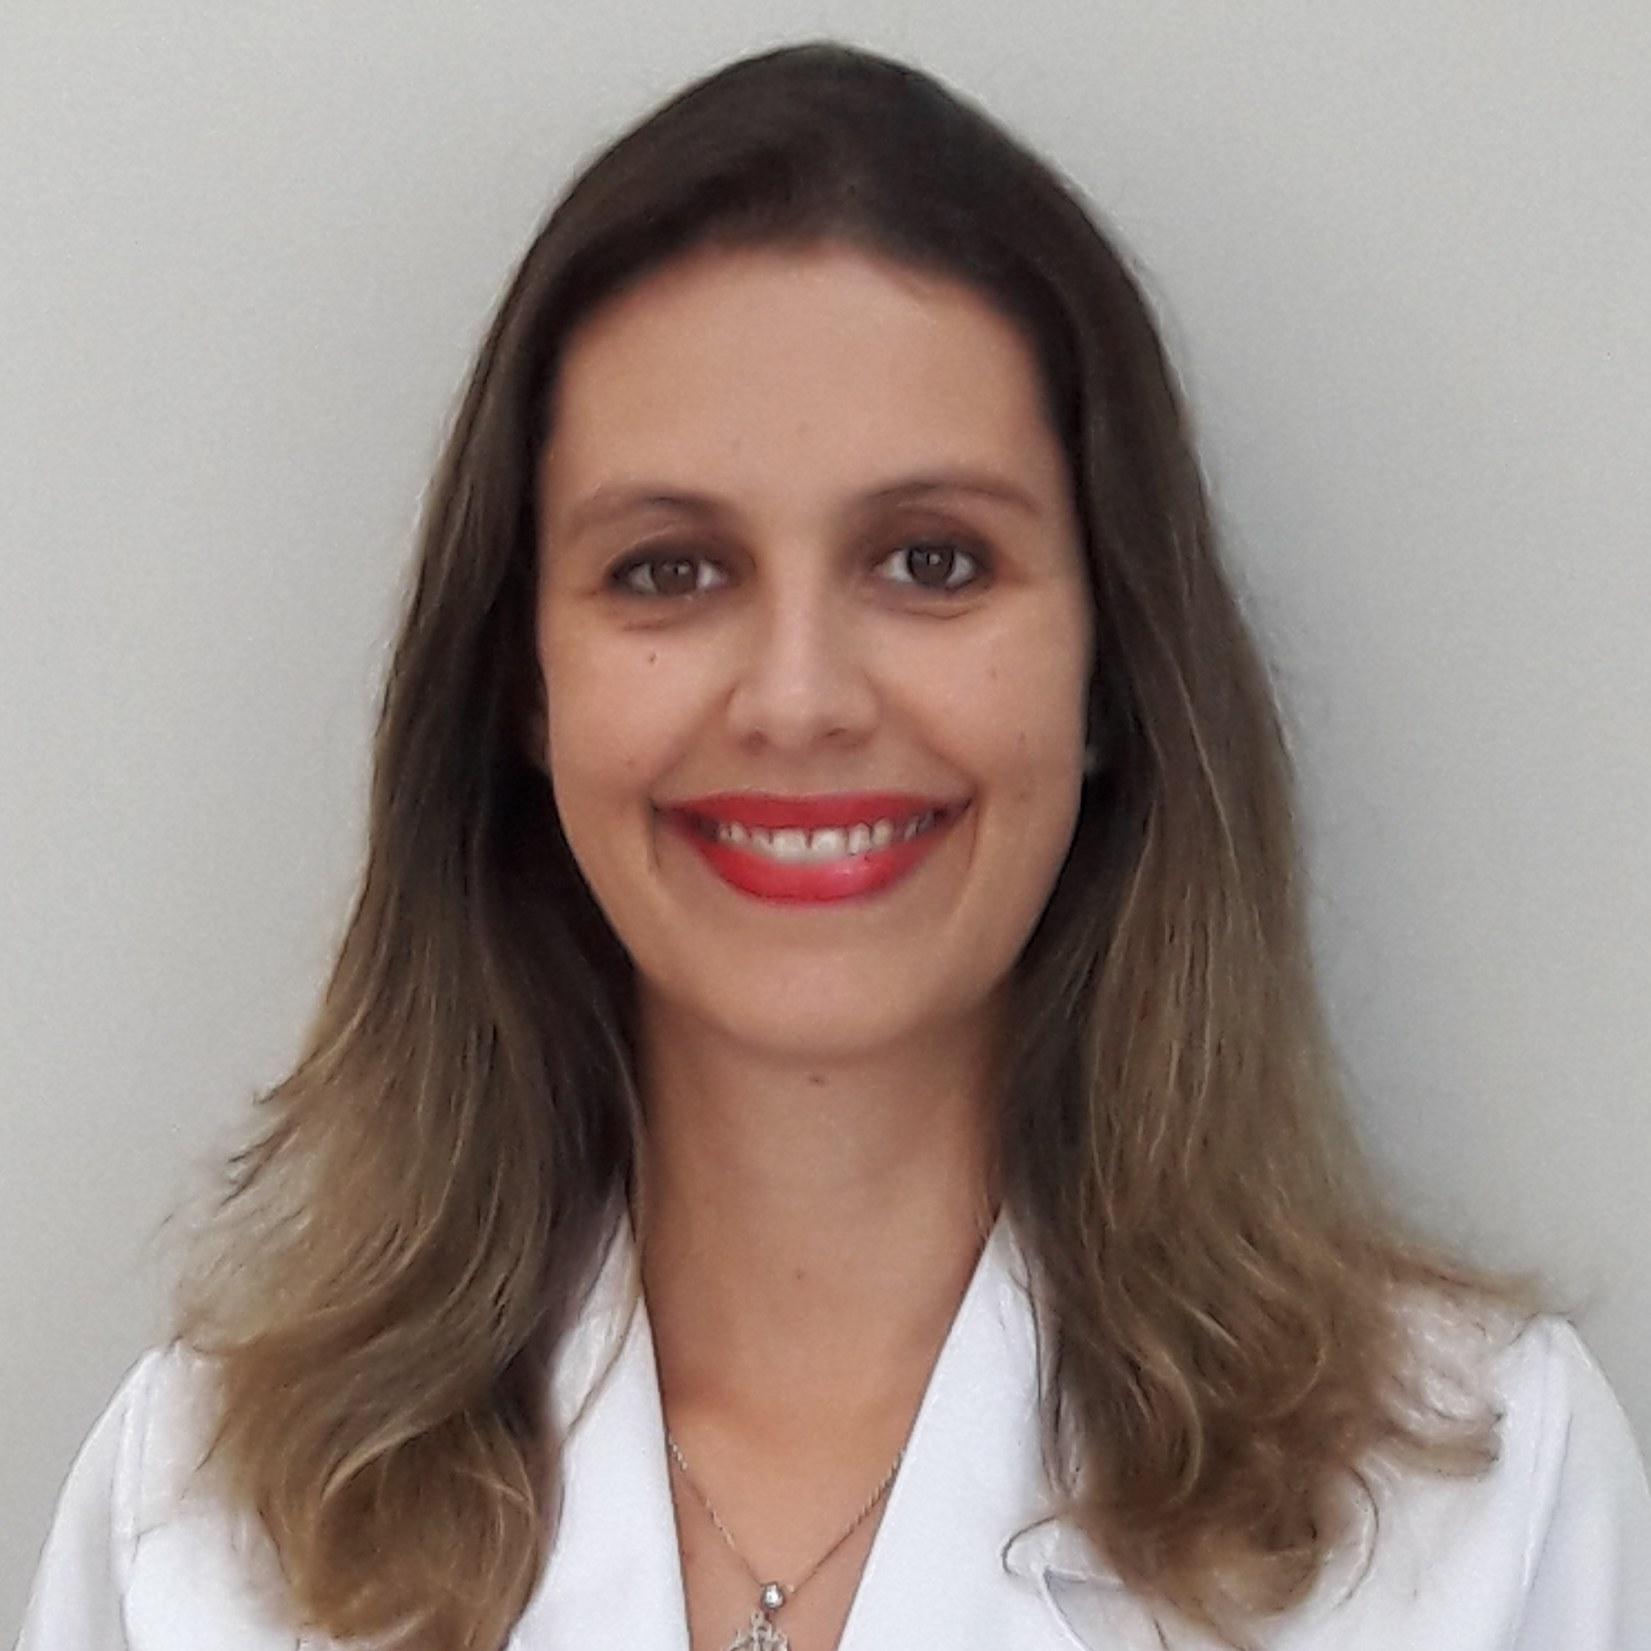 Flávia Nicoliello Leite